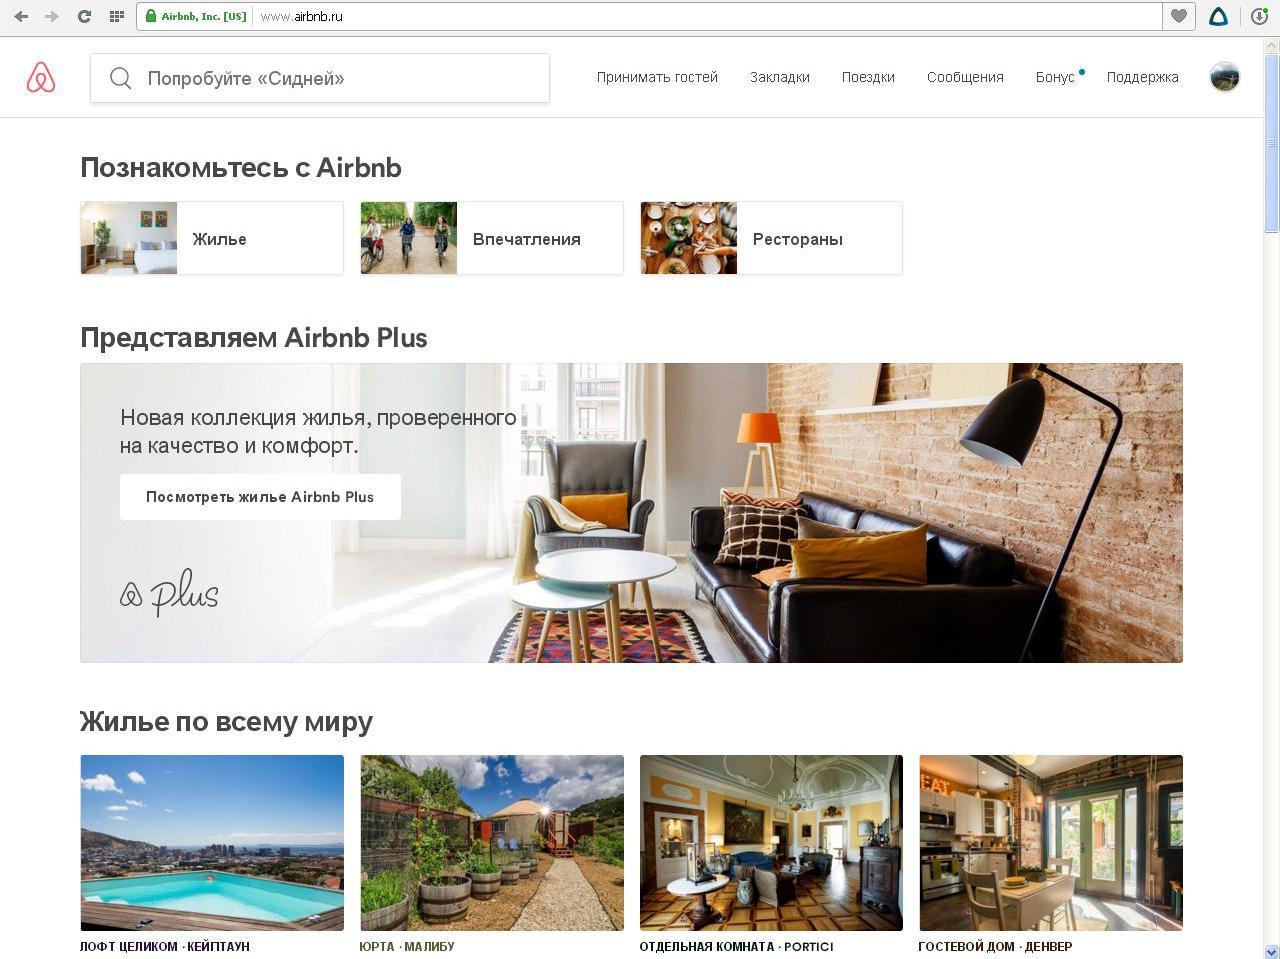 airbnb аренда жилья